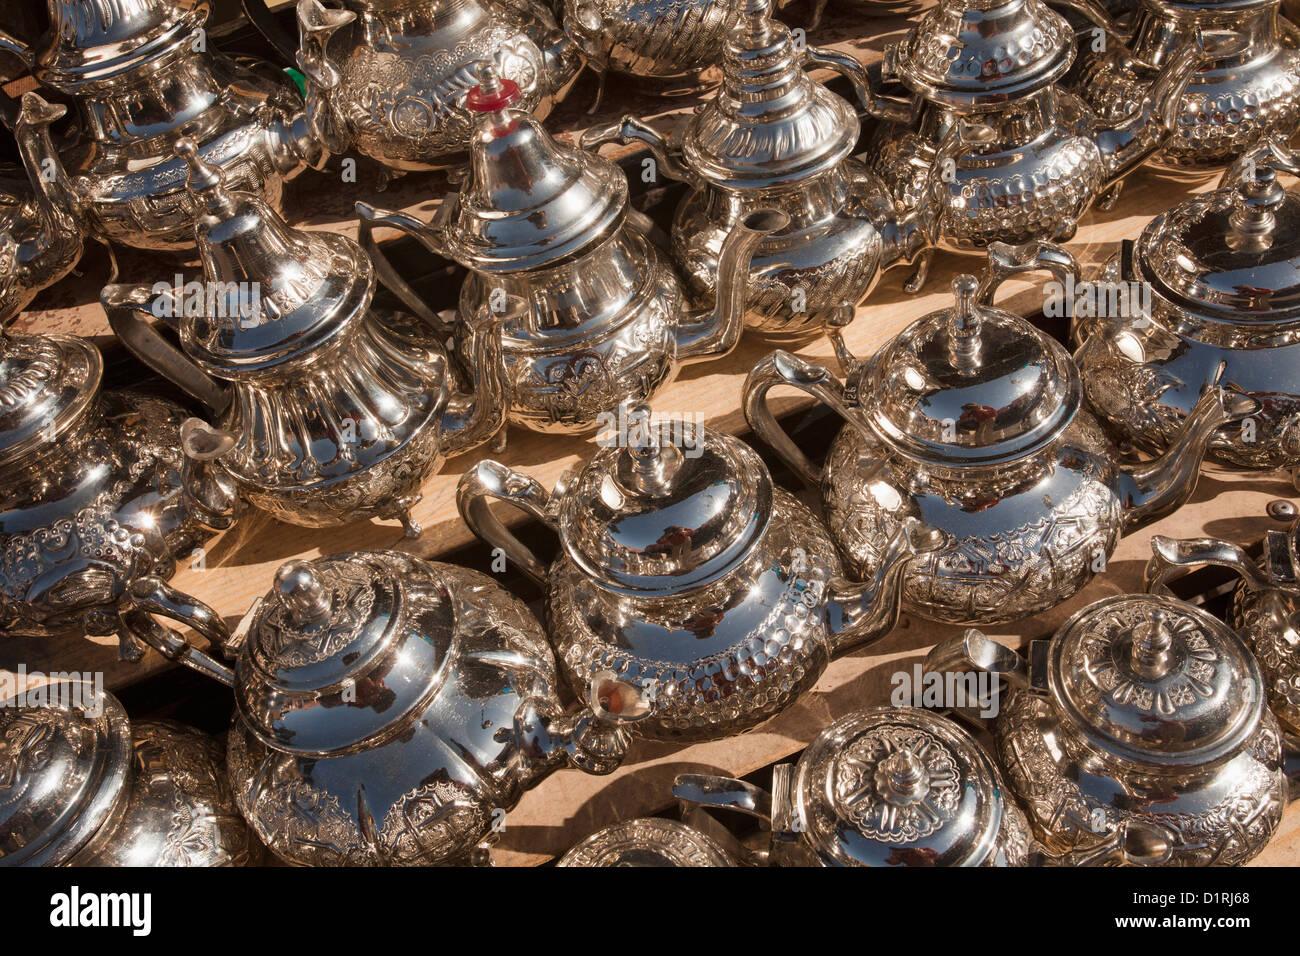 Marokko, Marrakesch, Markt. Teekannen zu verkaufen. Stockbild